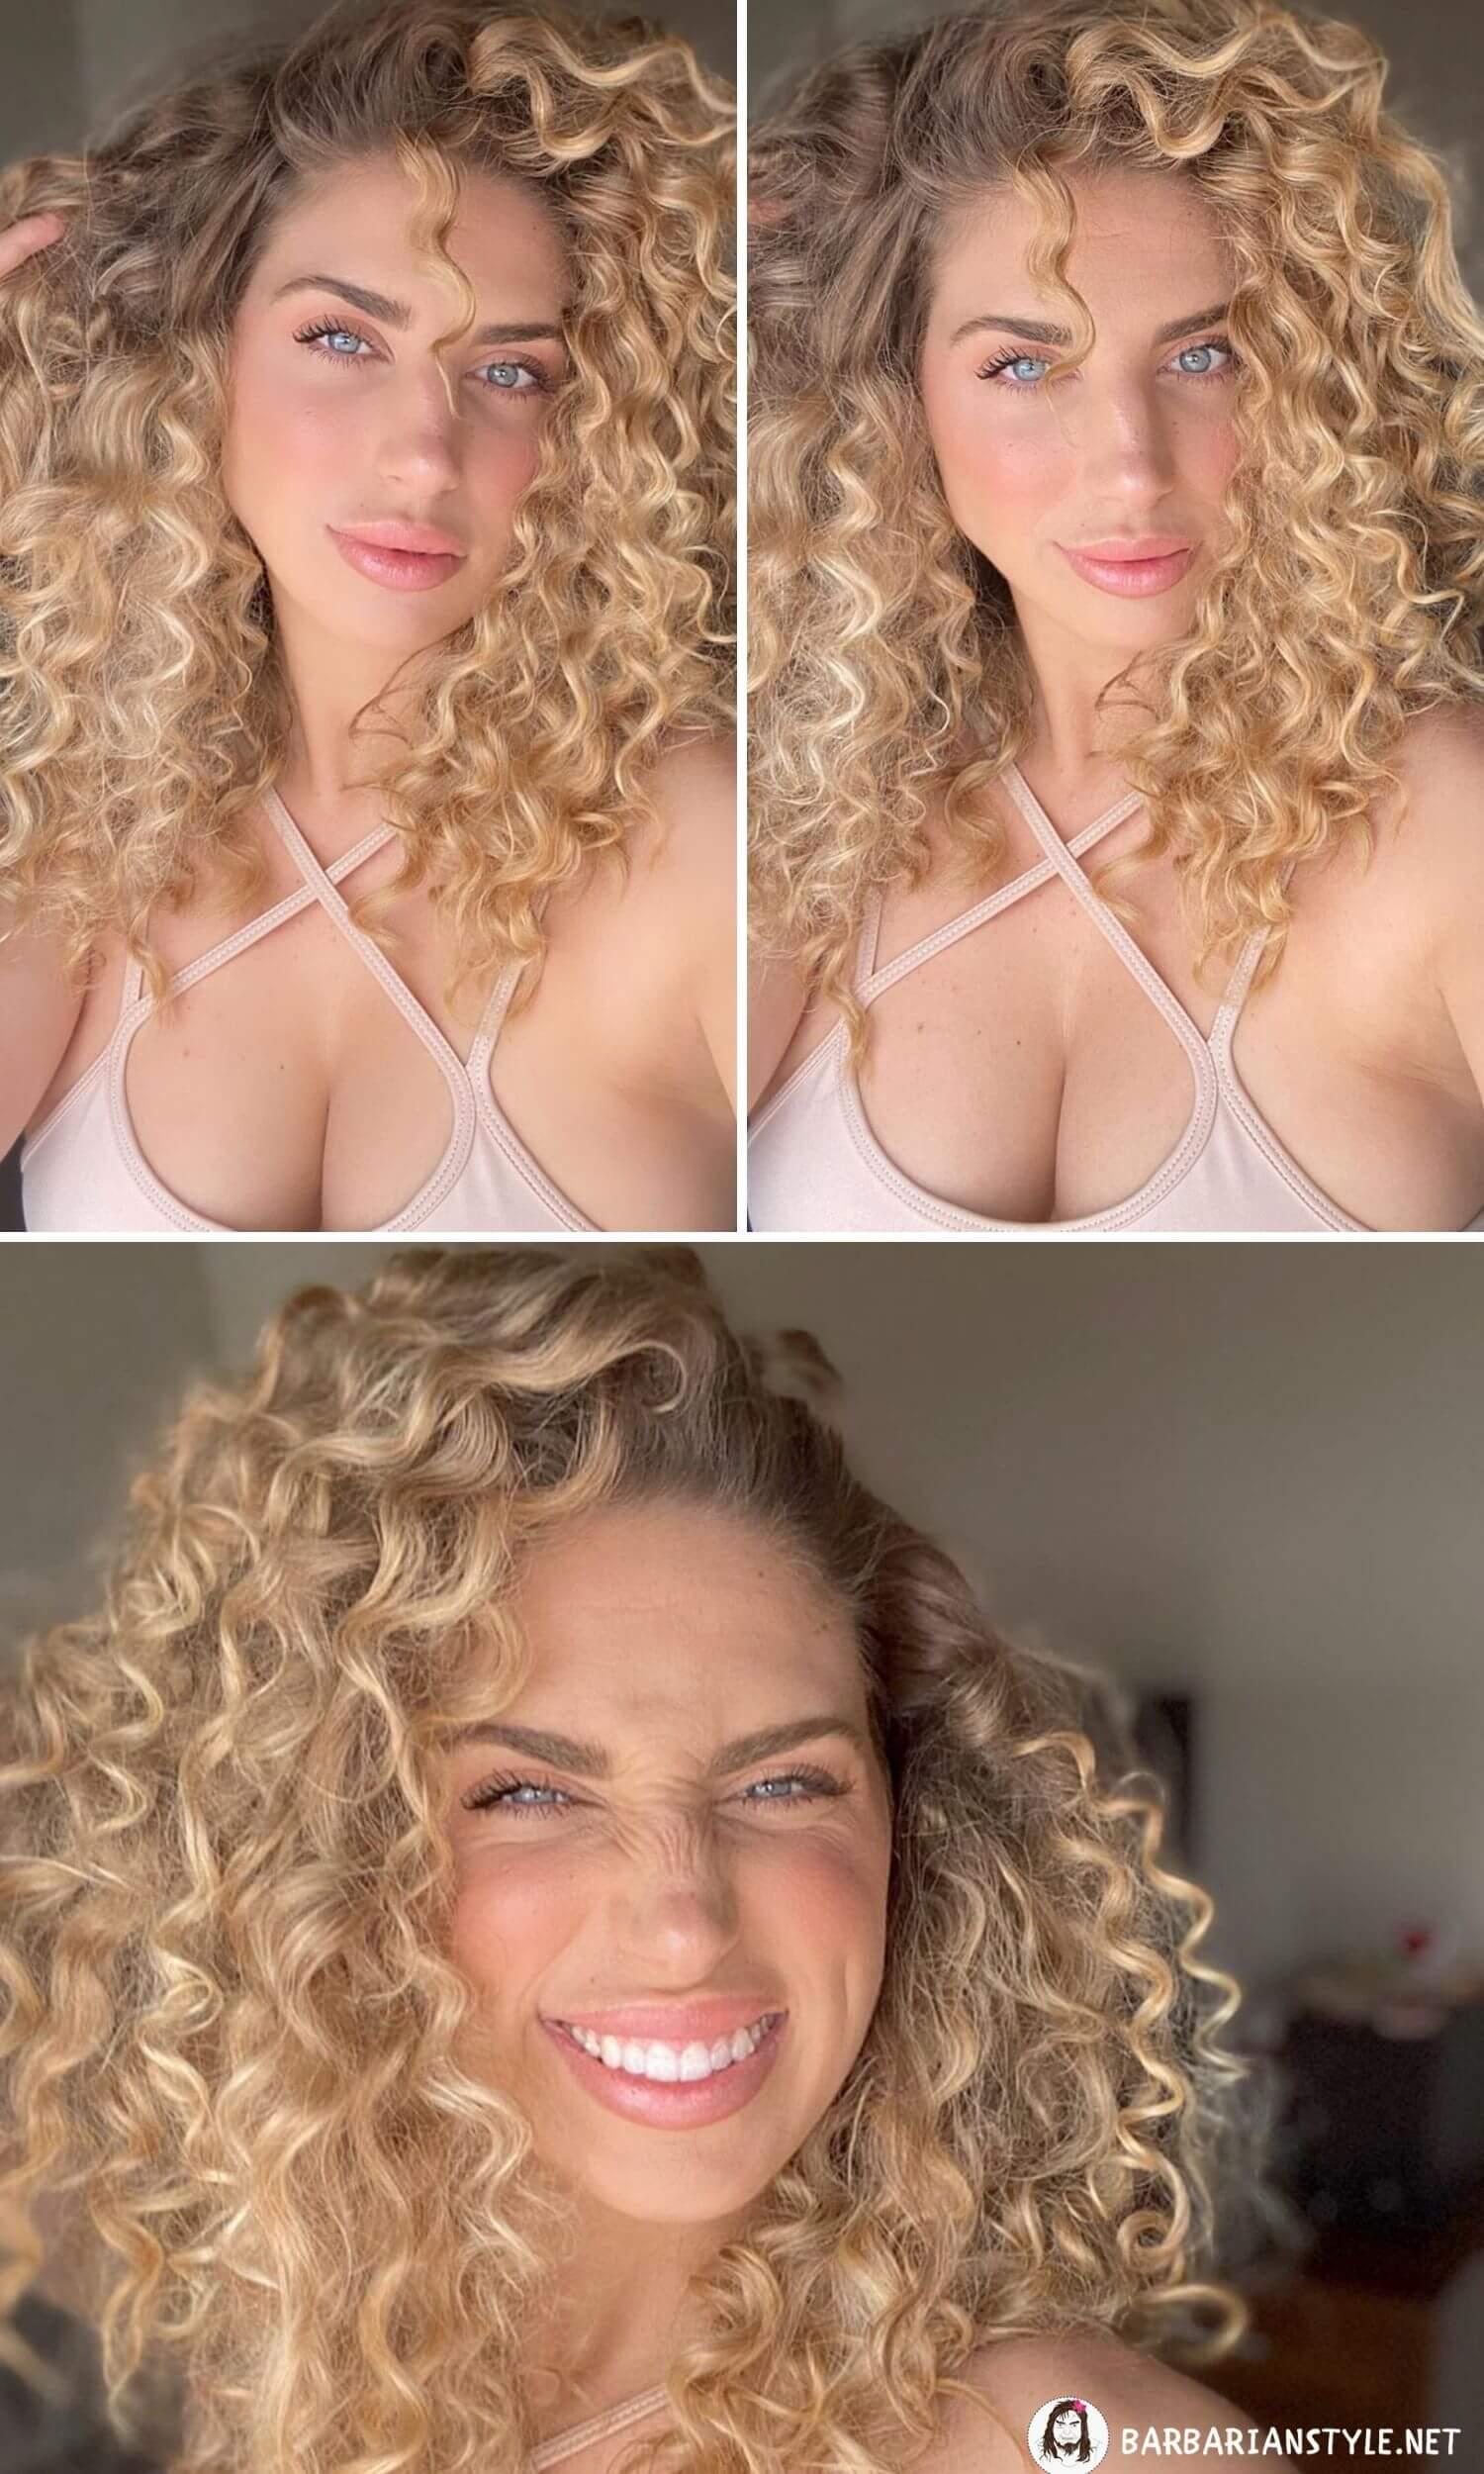 Medium-Length Curly Hairstyle